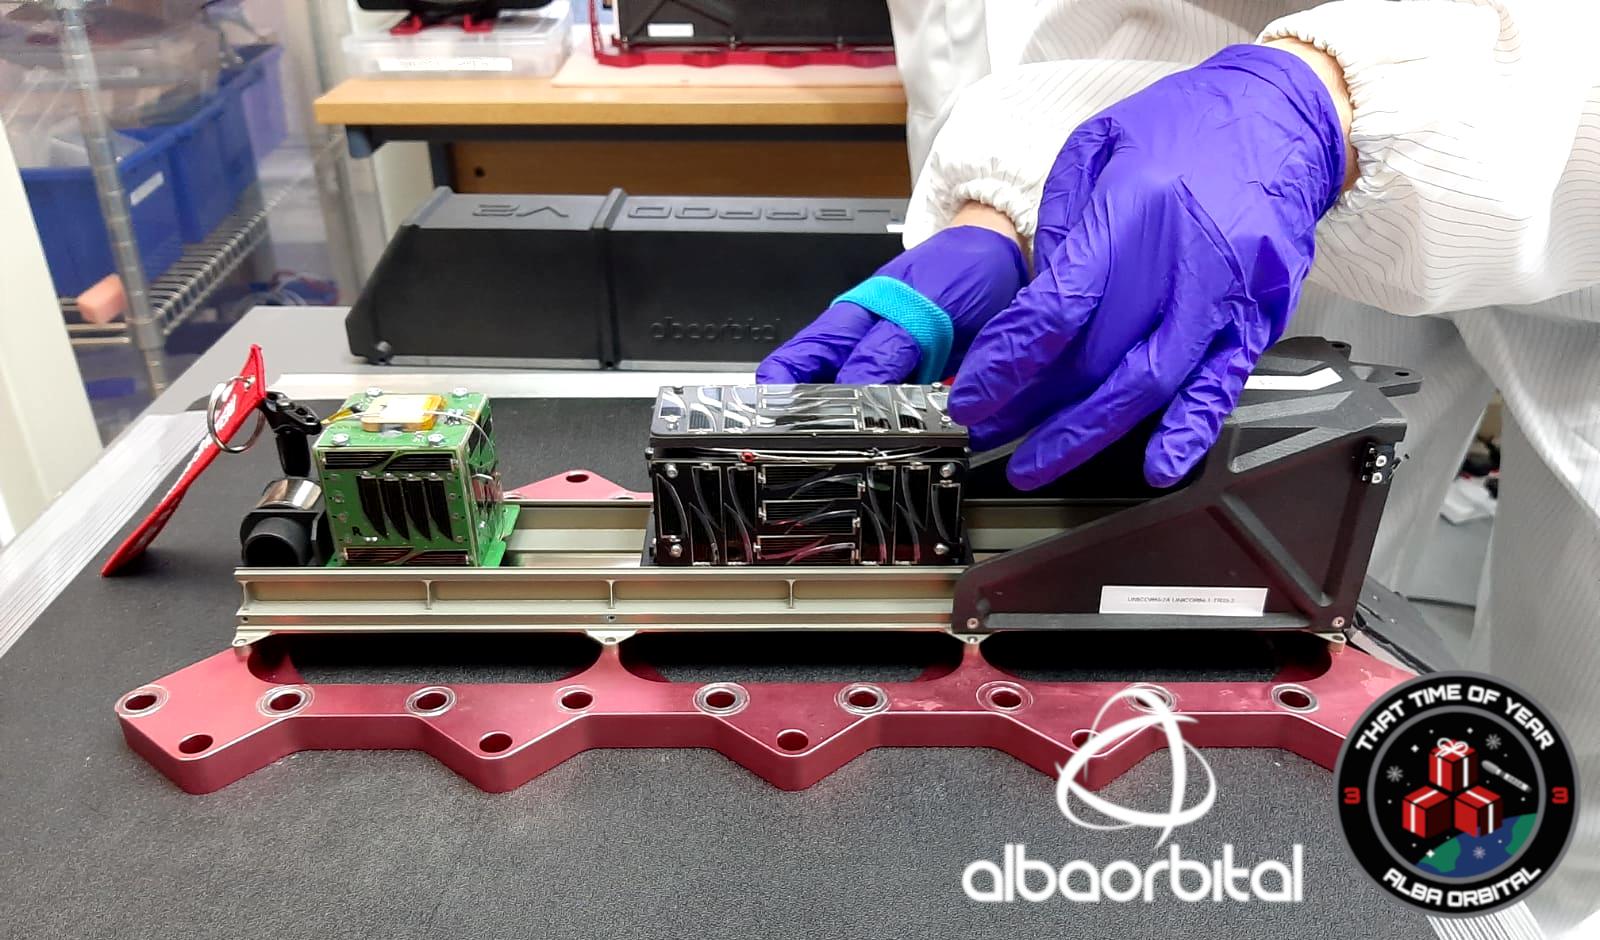 Alba Orbitalhas successfully integrated nine PocketQube satellites into its AlbaPod v2 deployer. Image via CRP Technology.